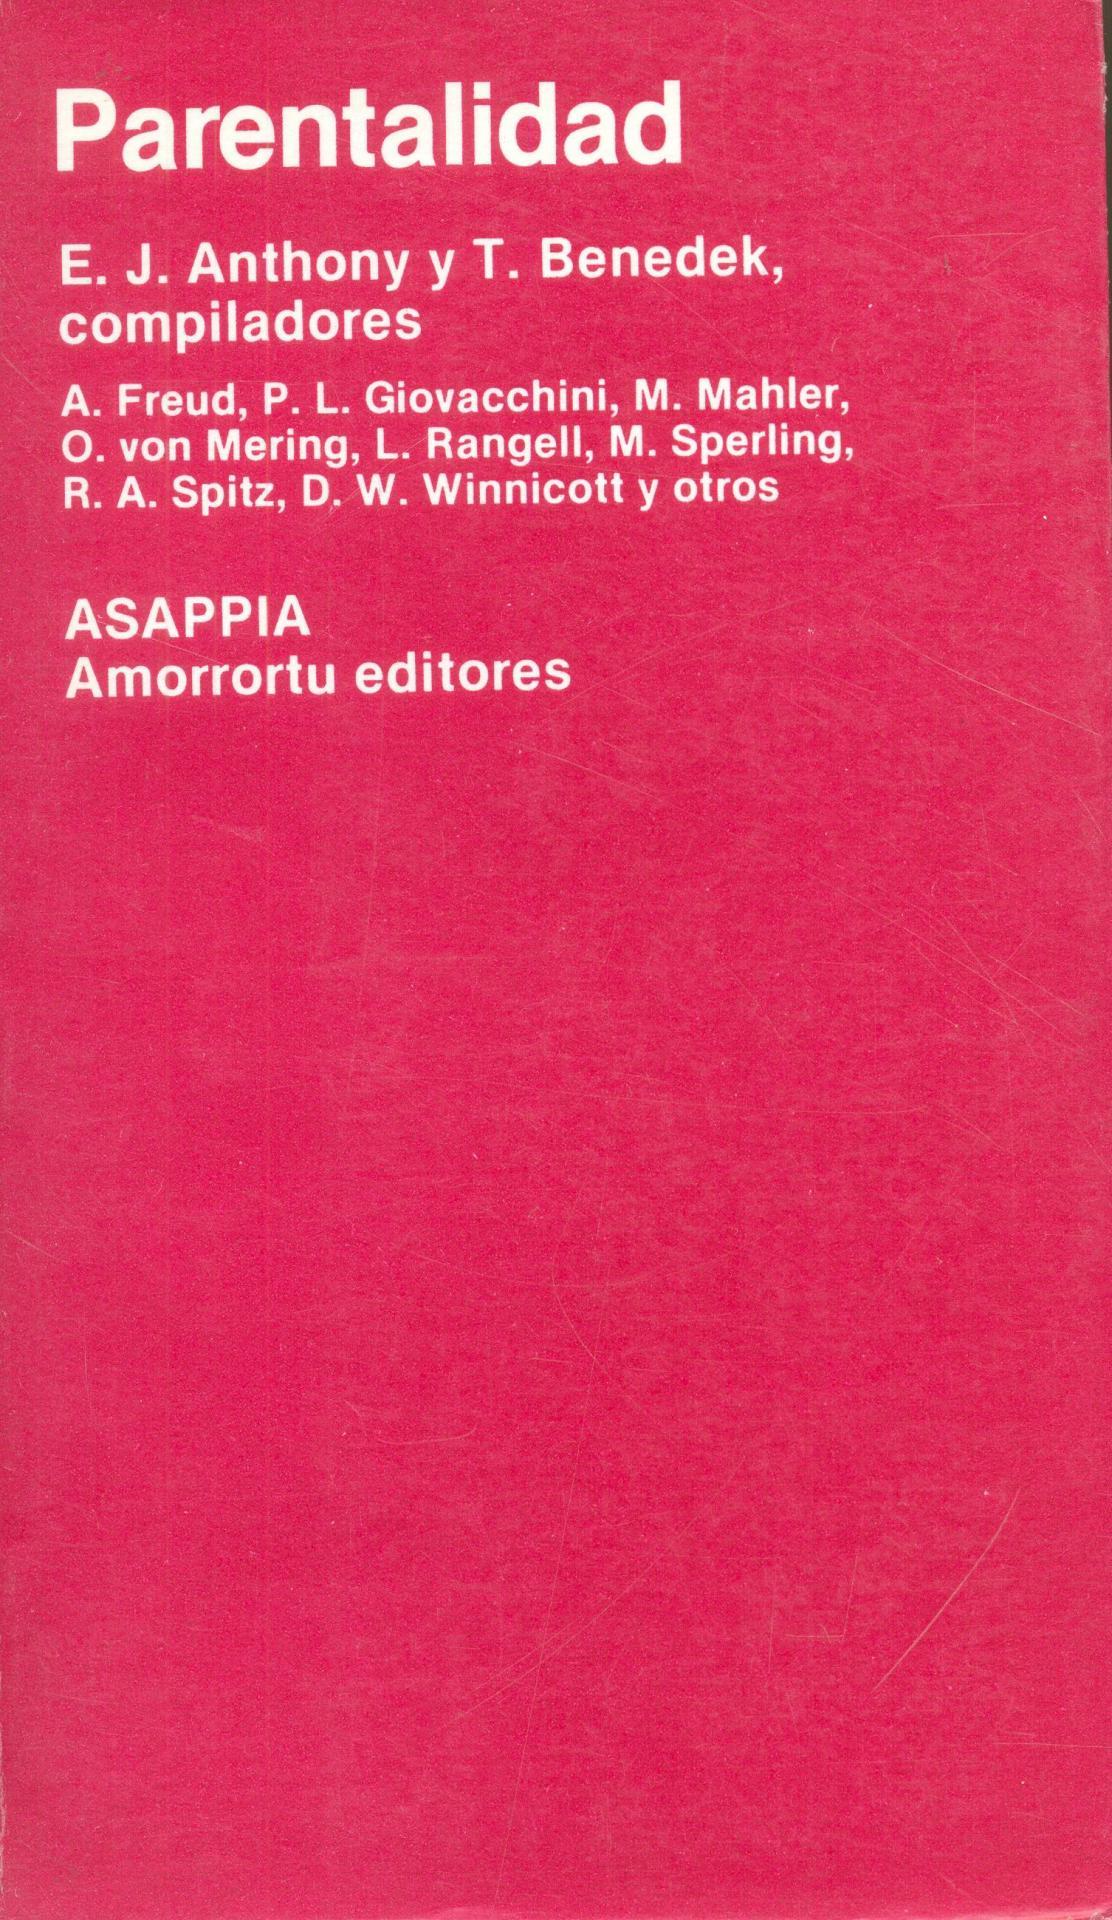 PARENTALIDAD.  Anthony, EJ.; Benedeck, T. compiladores.